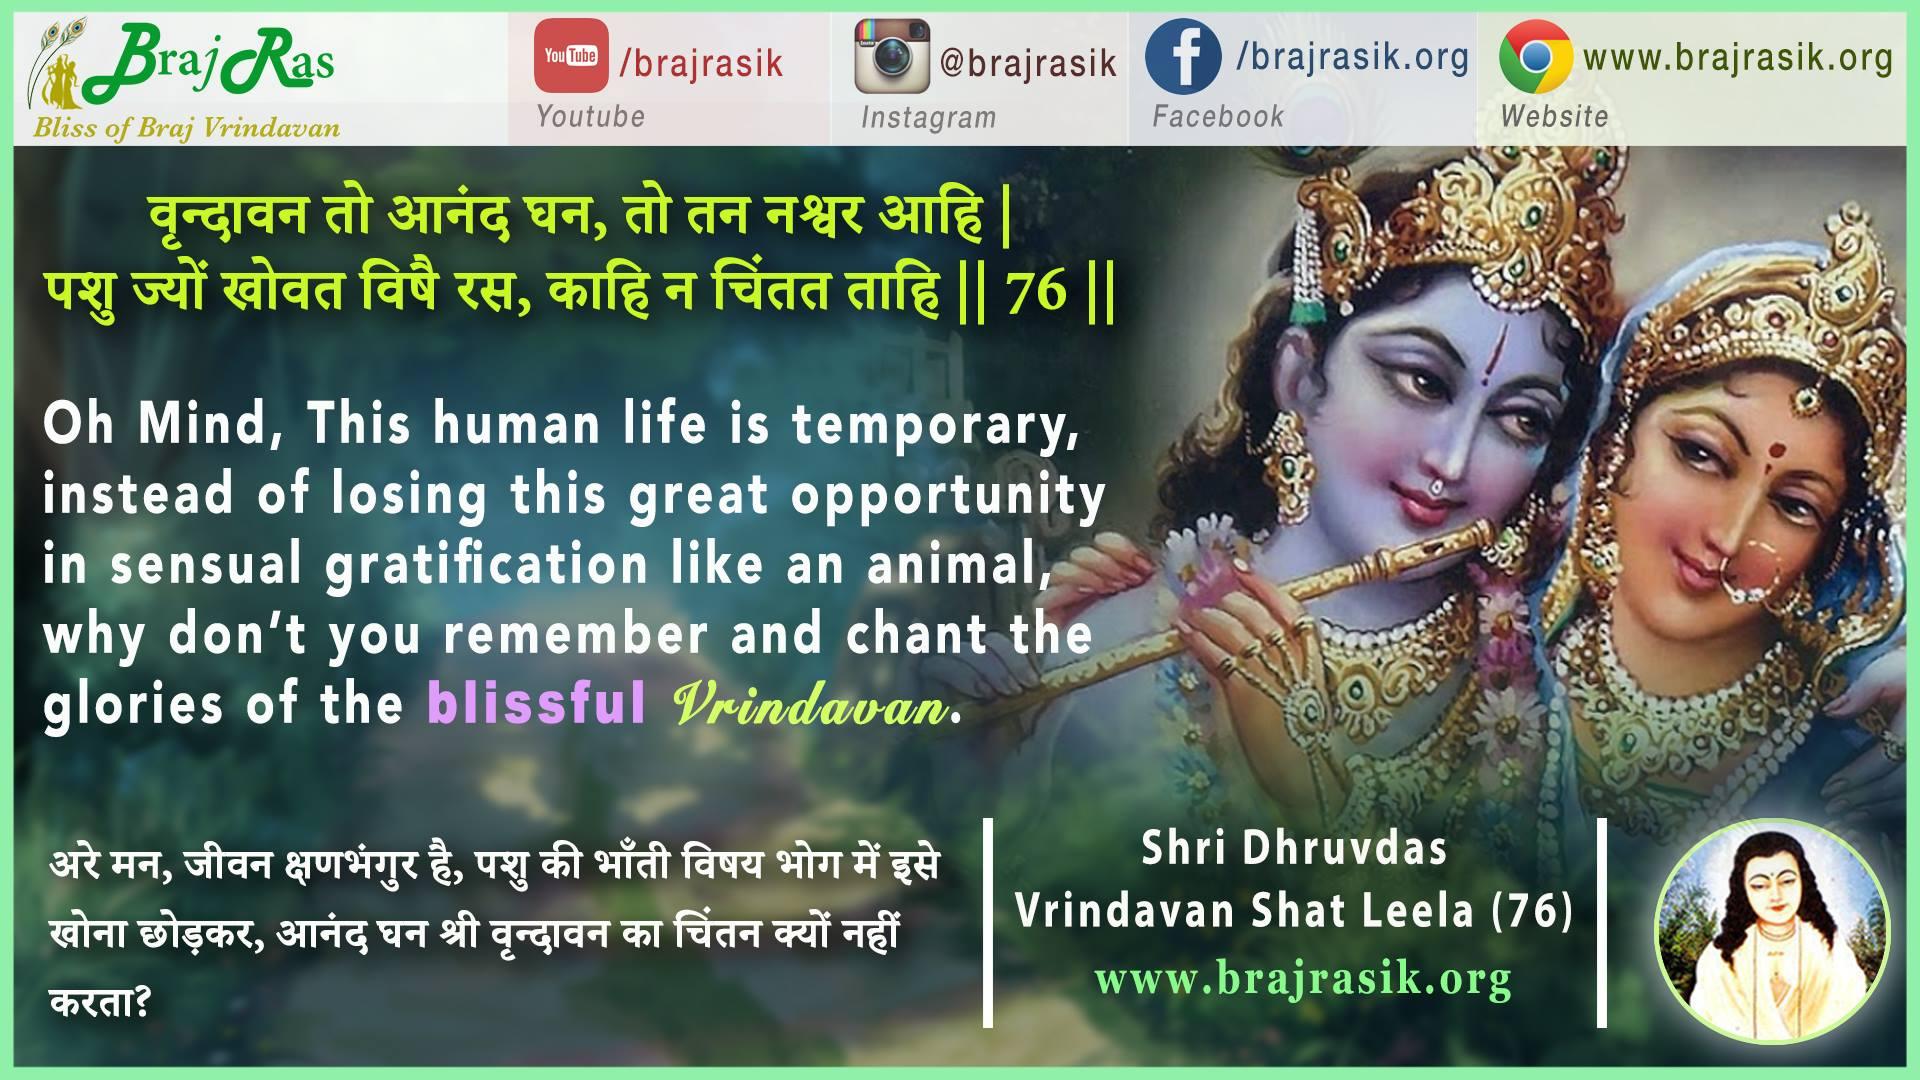 Vrindavan To Anand Ghan - Shri Dhruvdas, Vrindavan Shat Leela